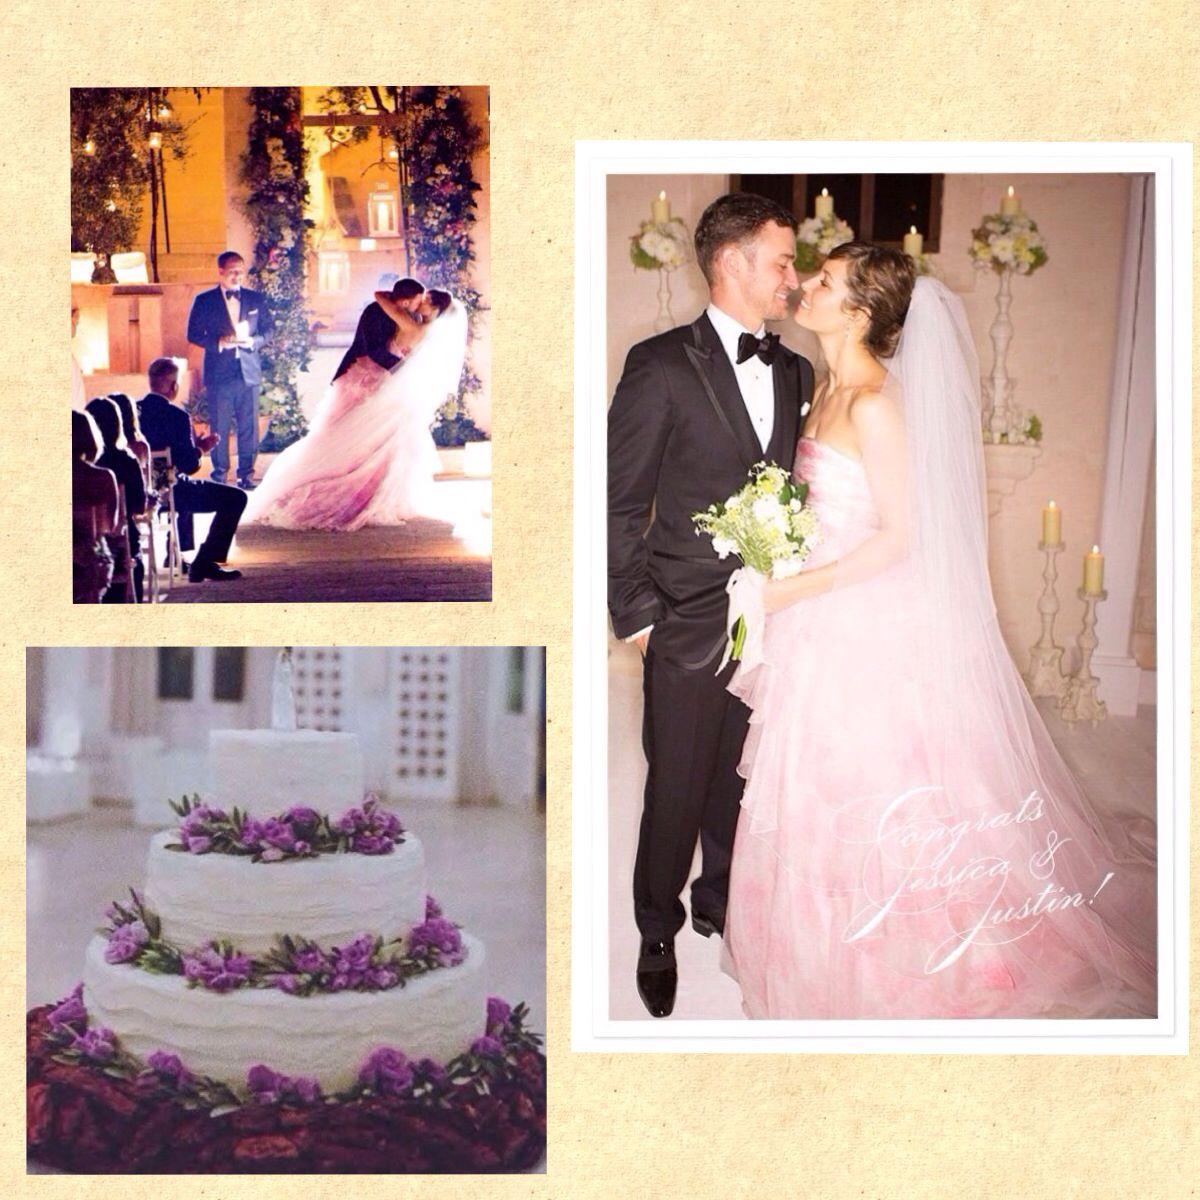 Justin Timberlake And Jessica Biel I Want A Wedding Kiss Like That 3